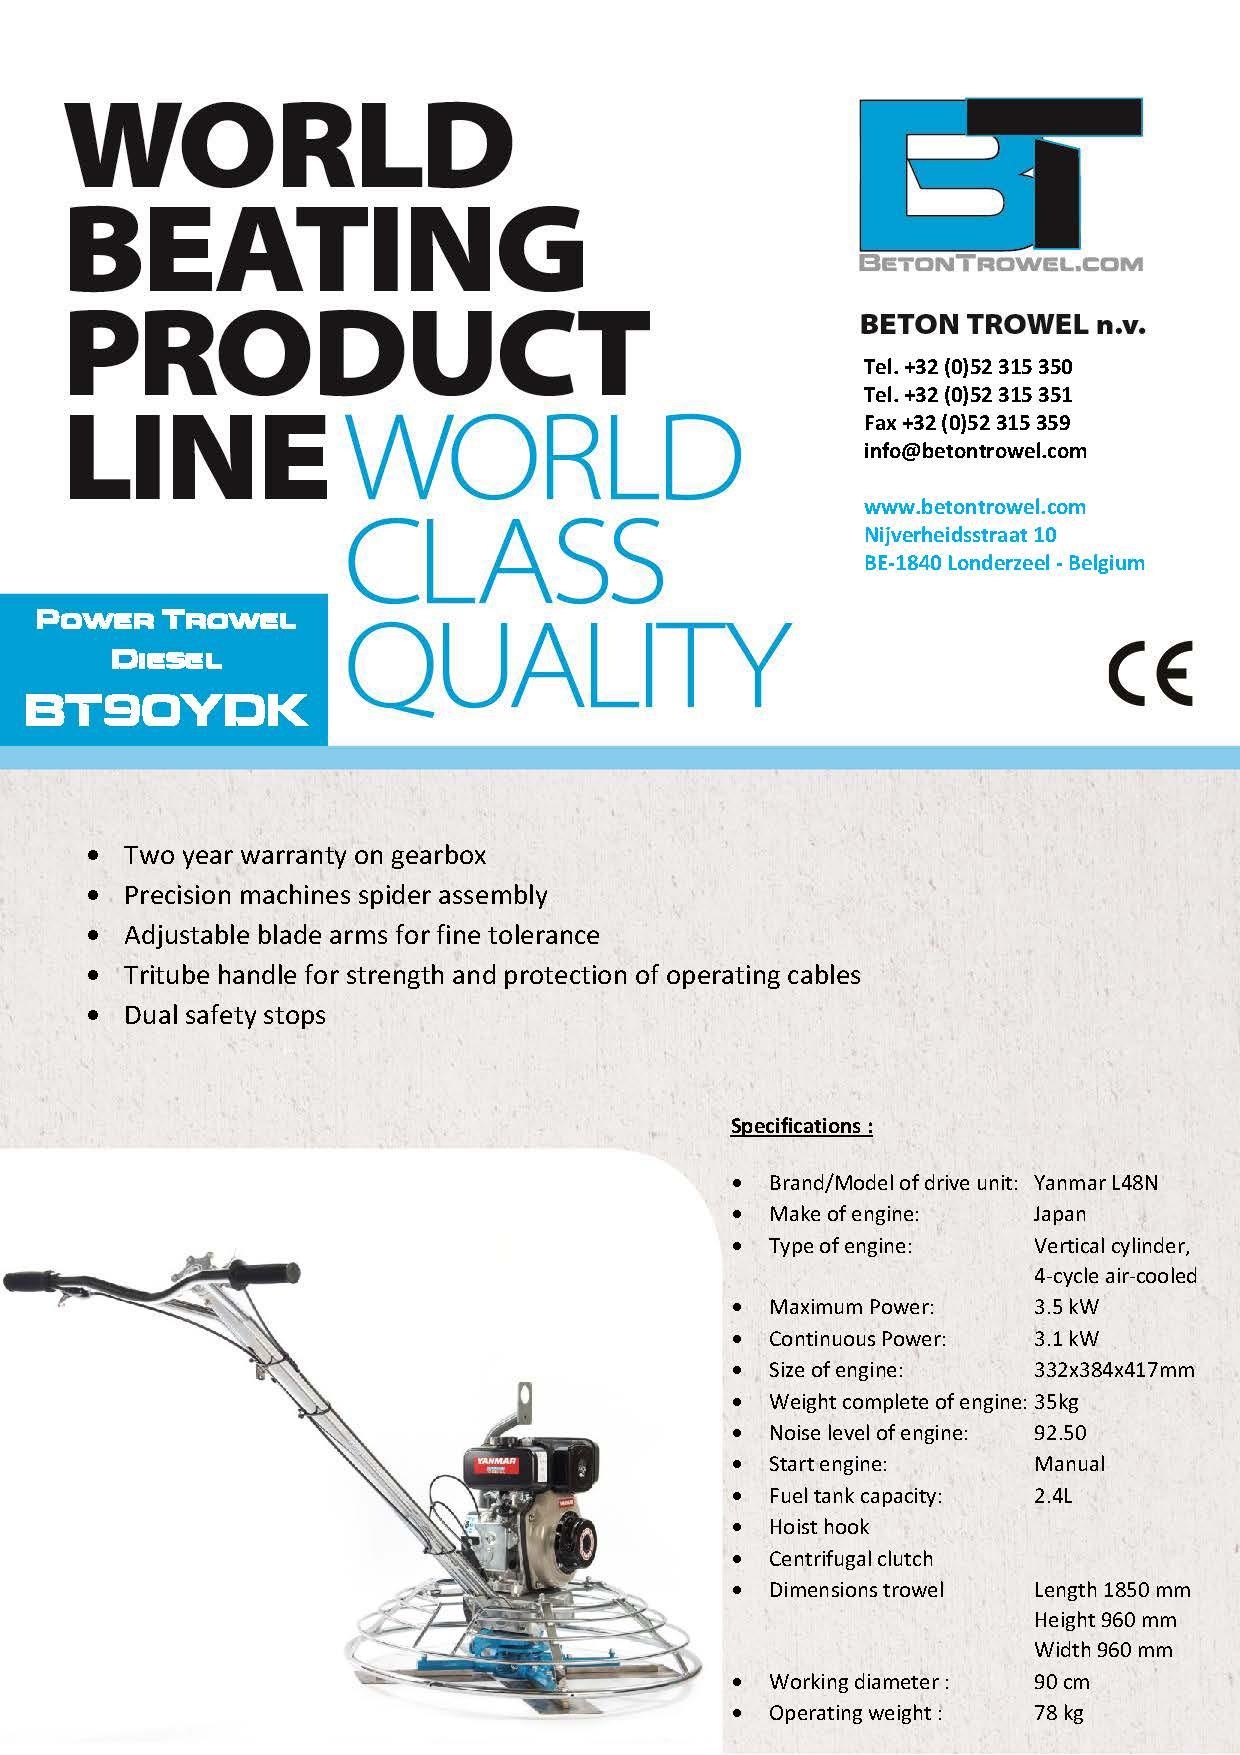 Power trowel BT90YDK